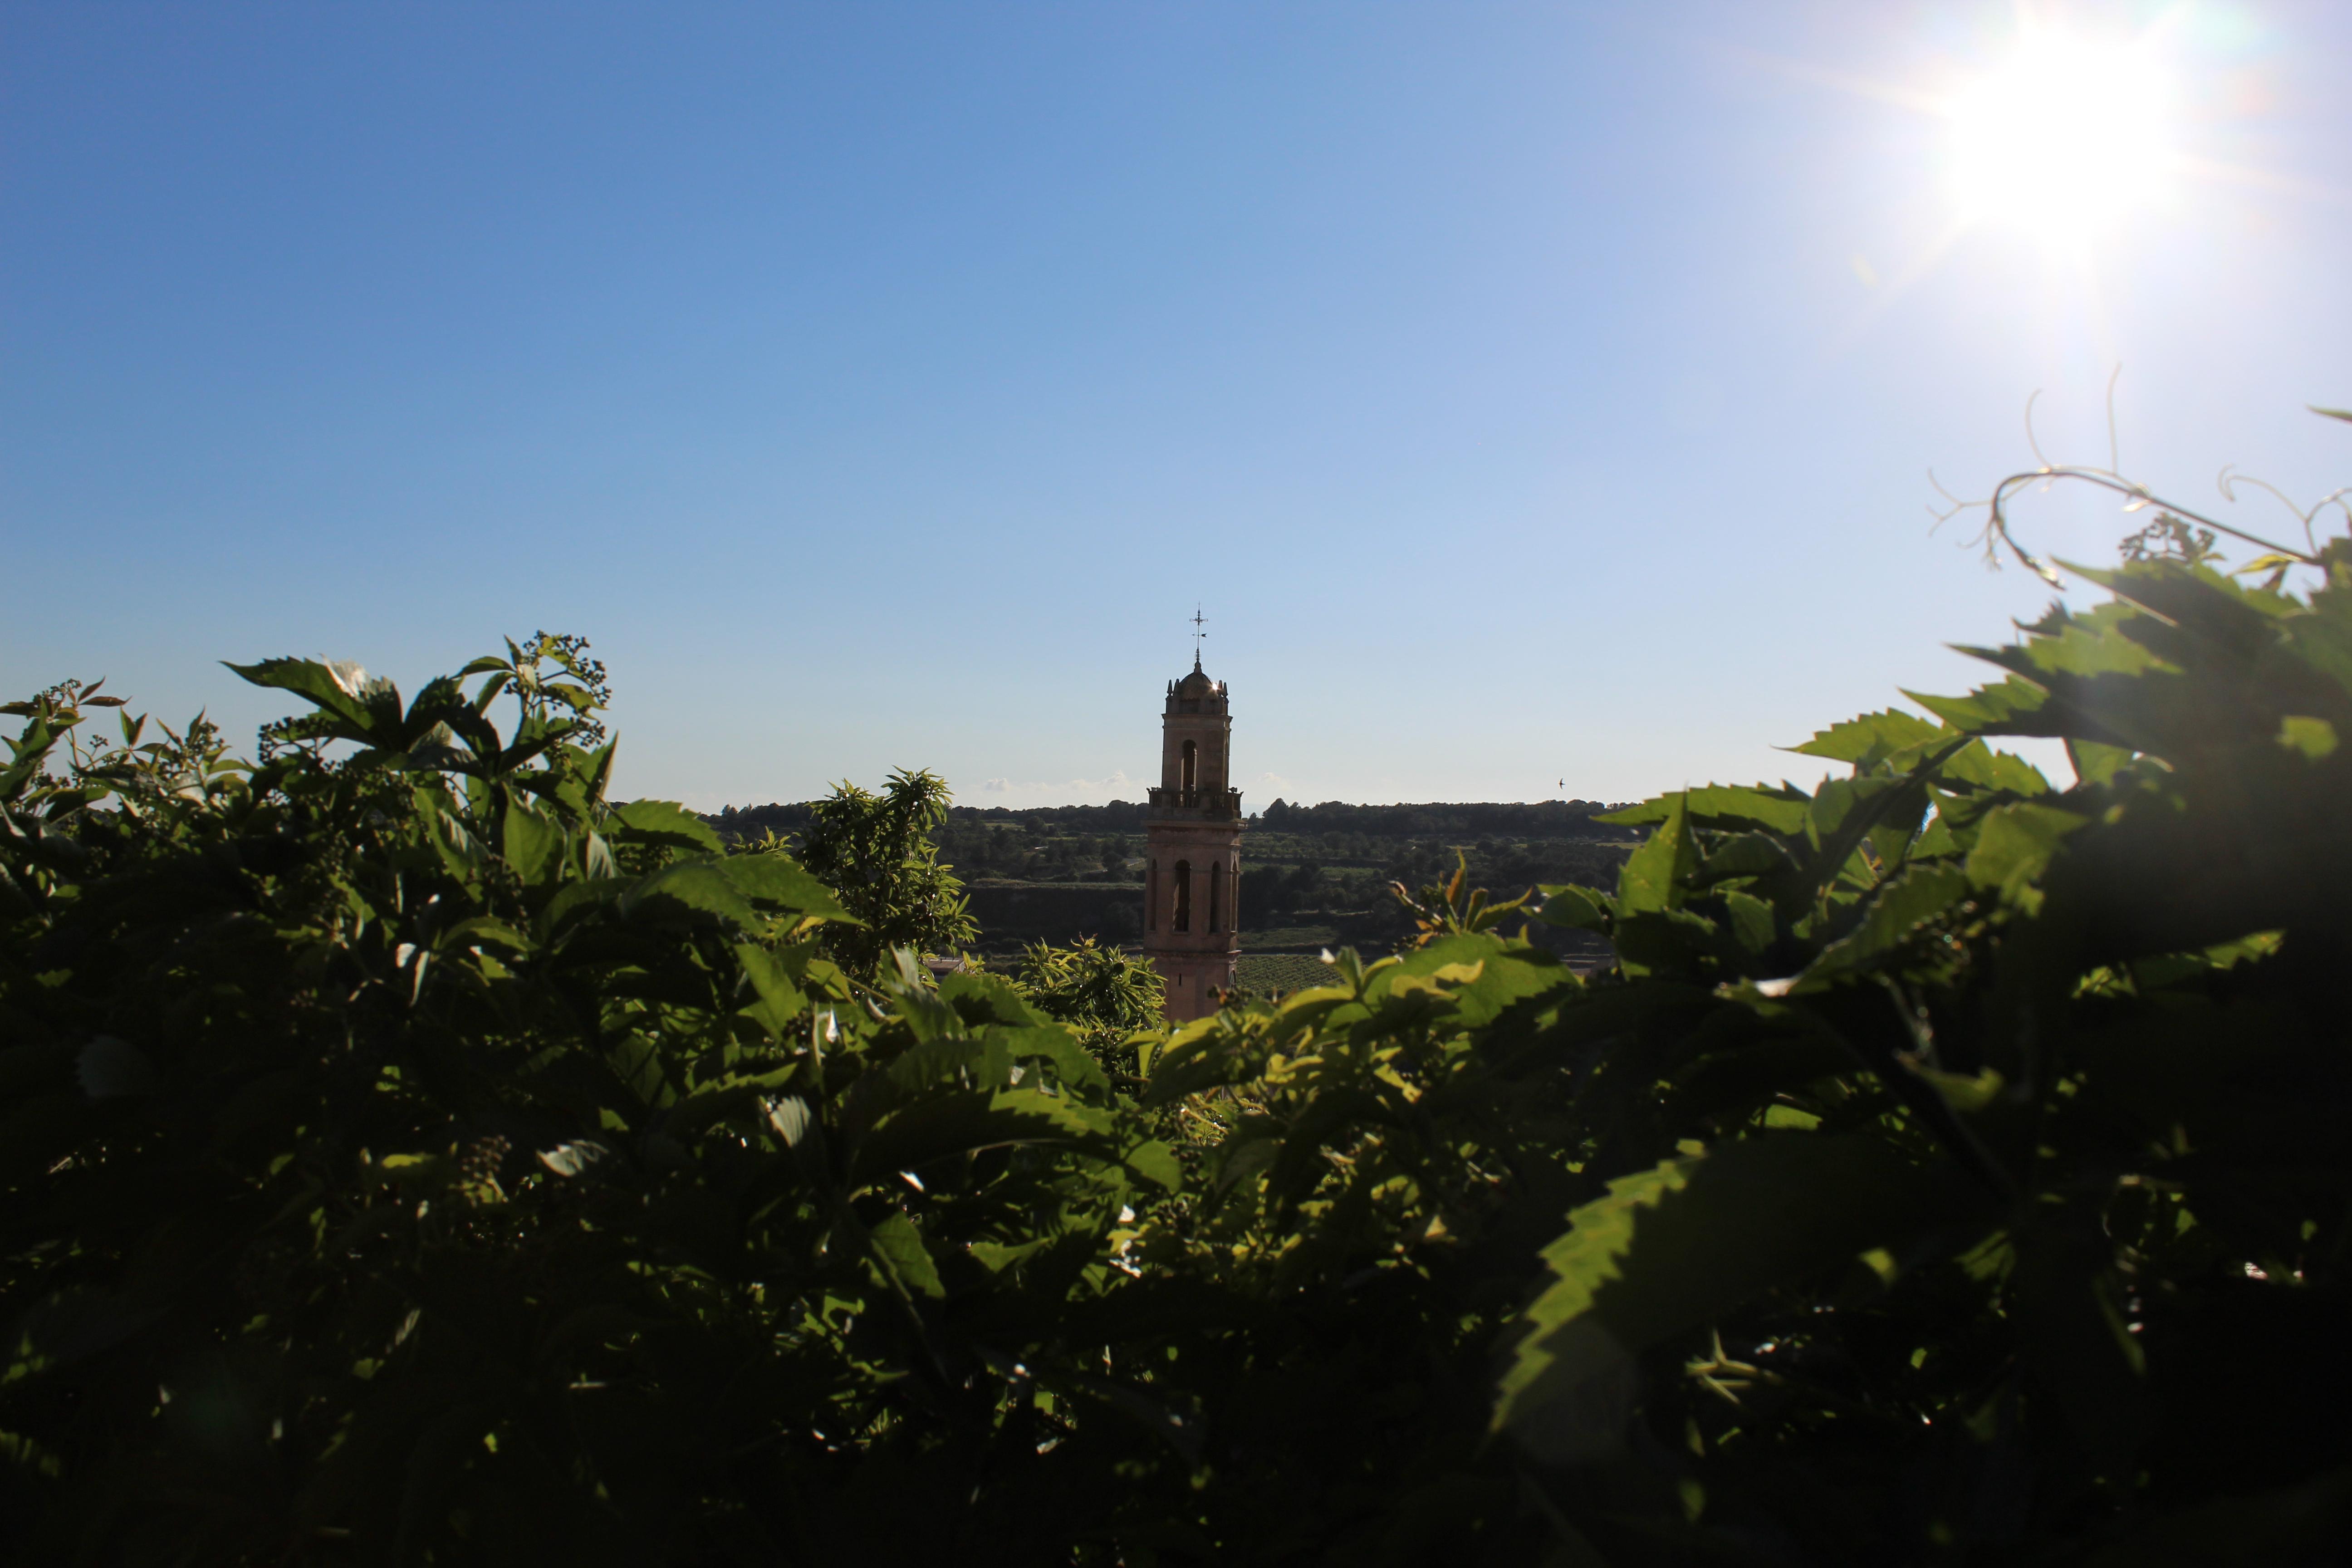 Castle of Vila Rodona, Camp de Tarragona